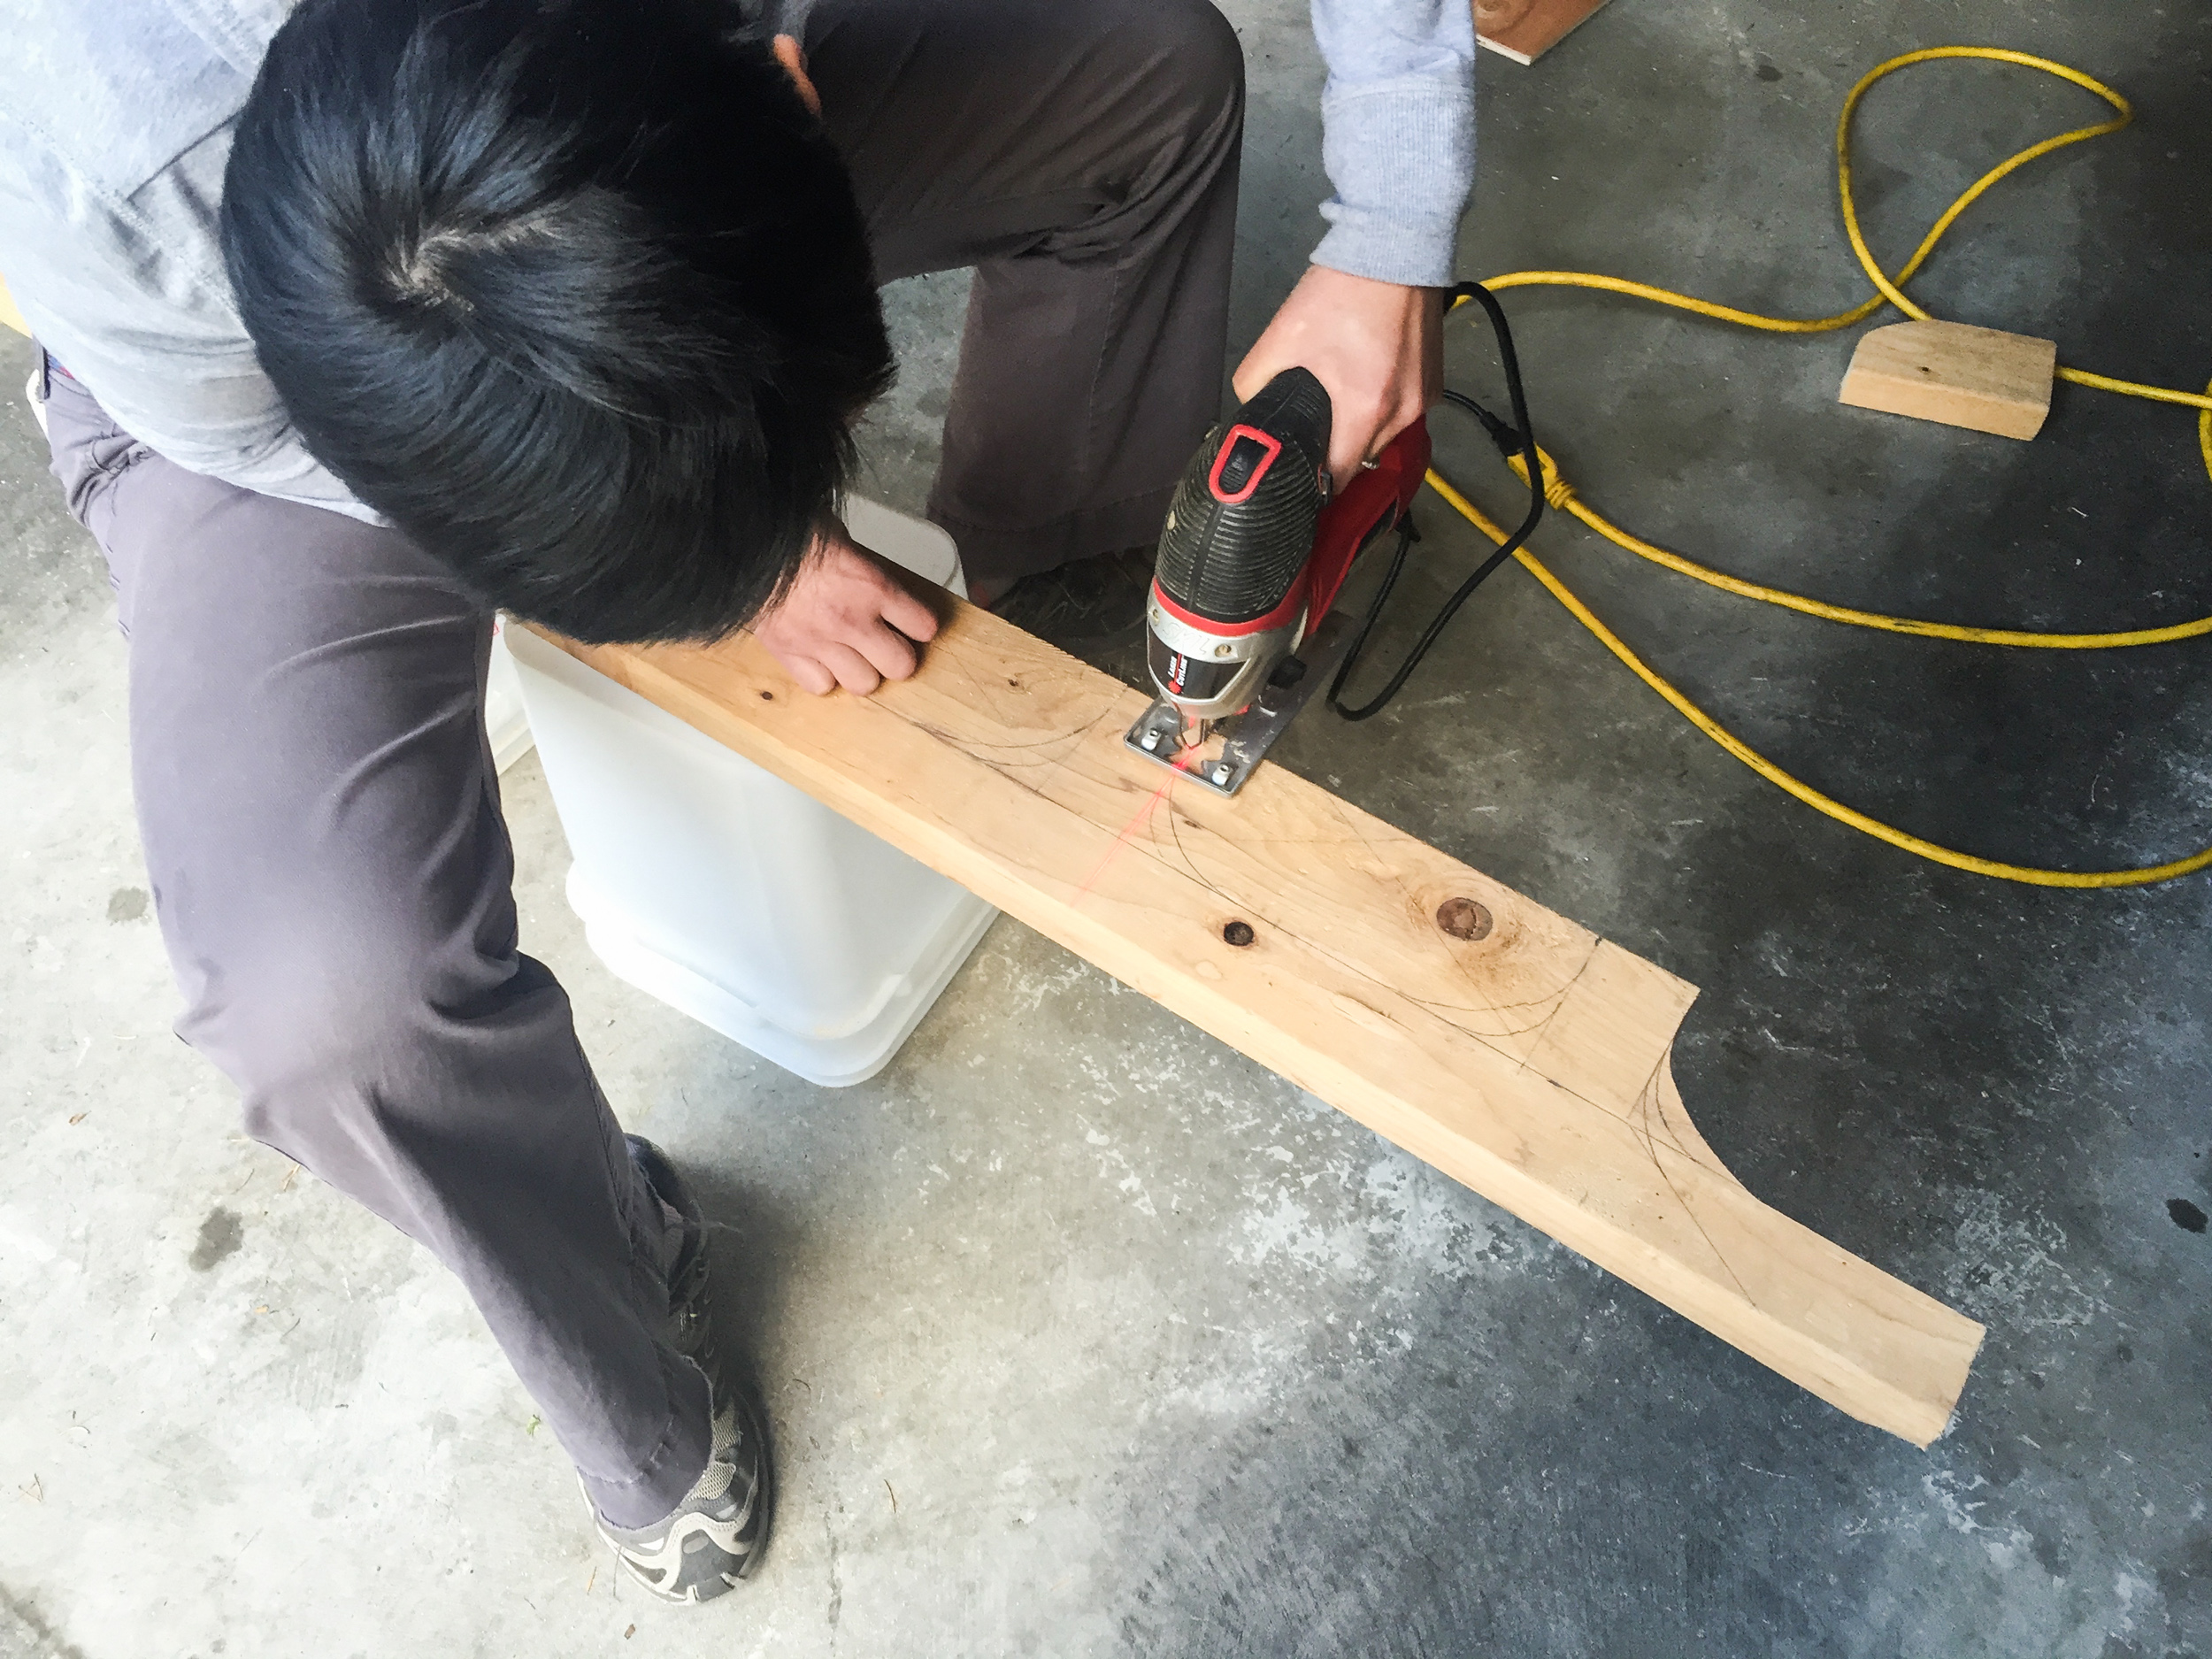 Cutting platform legs out of a 2x4.